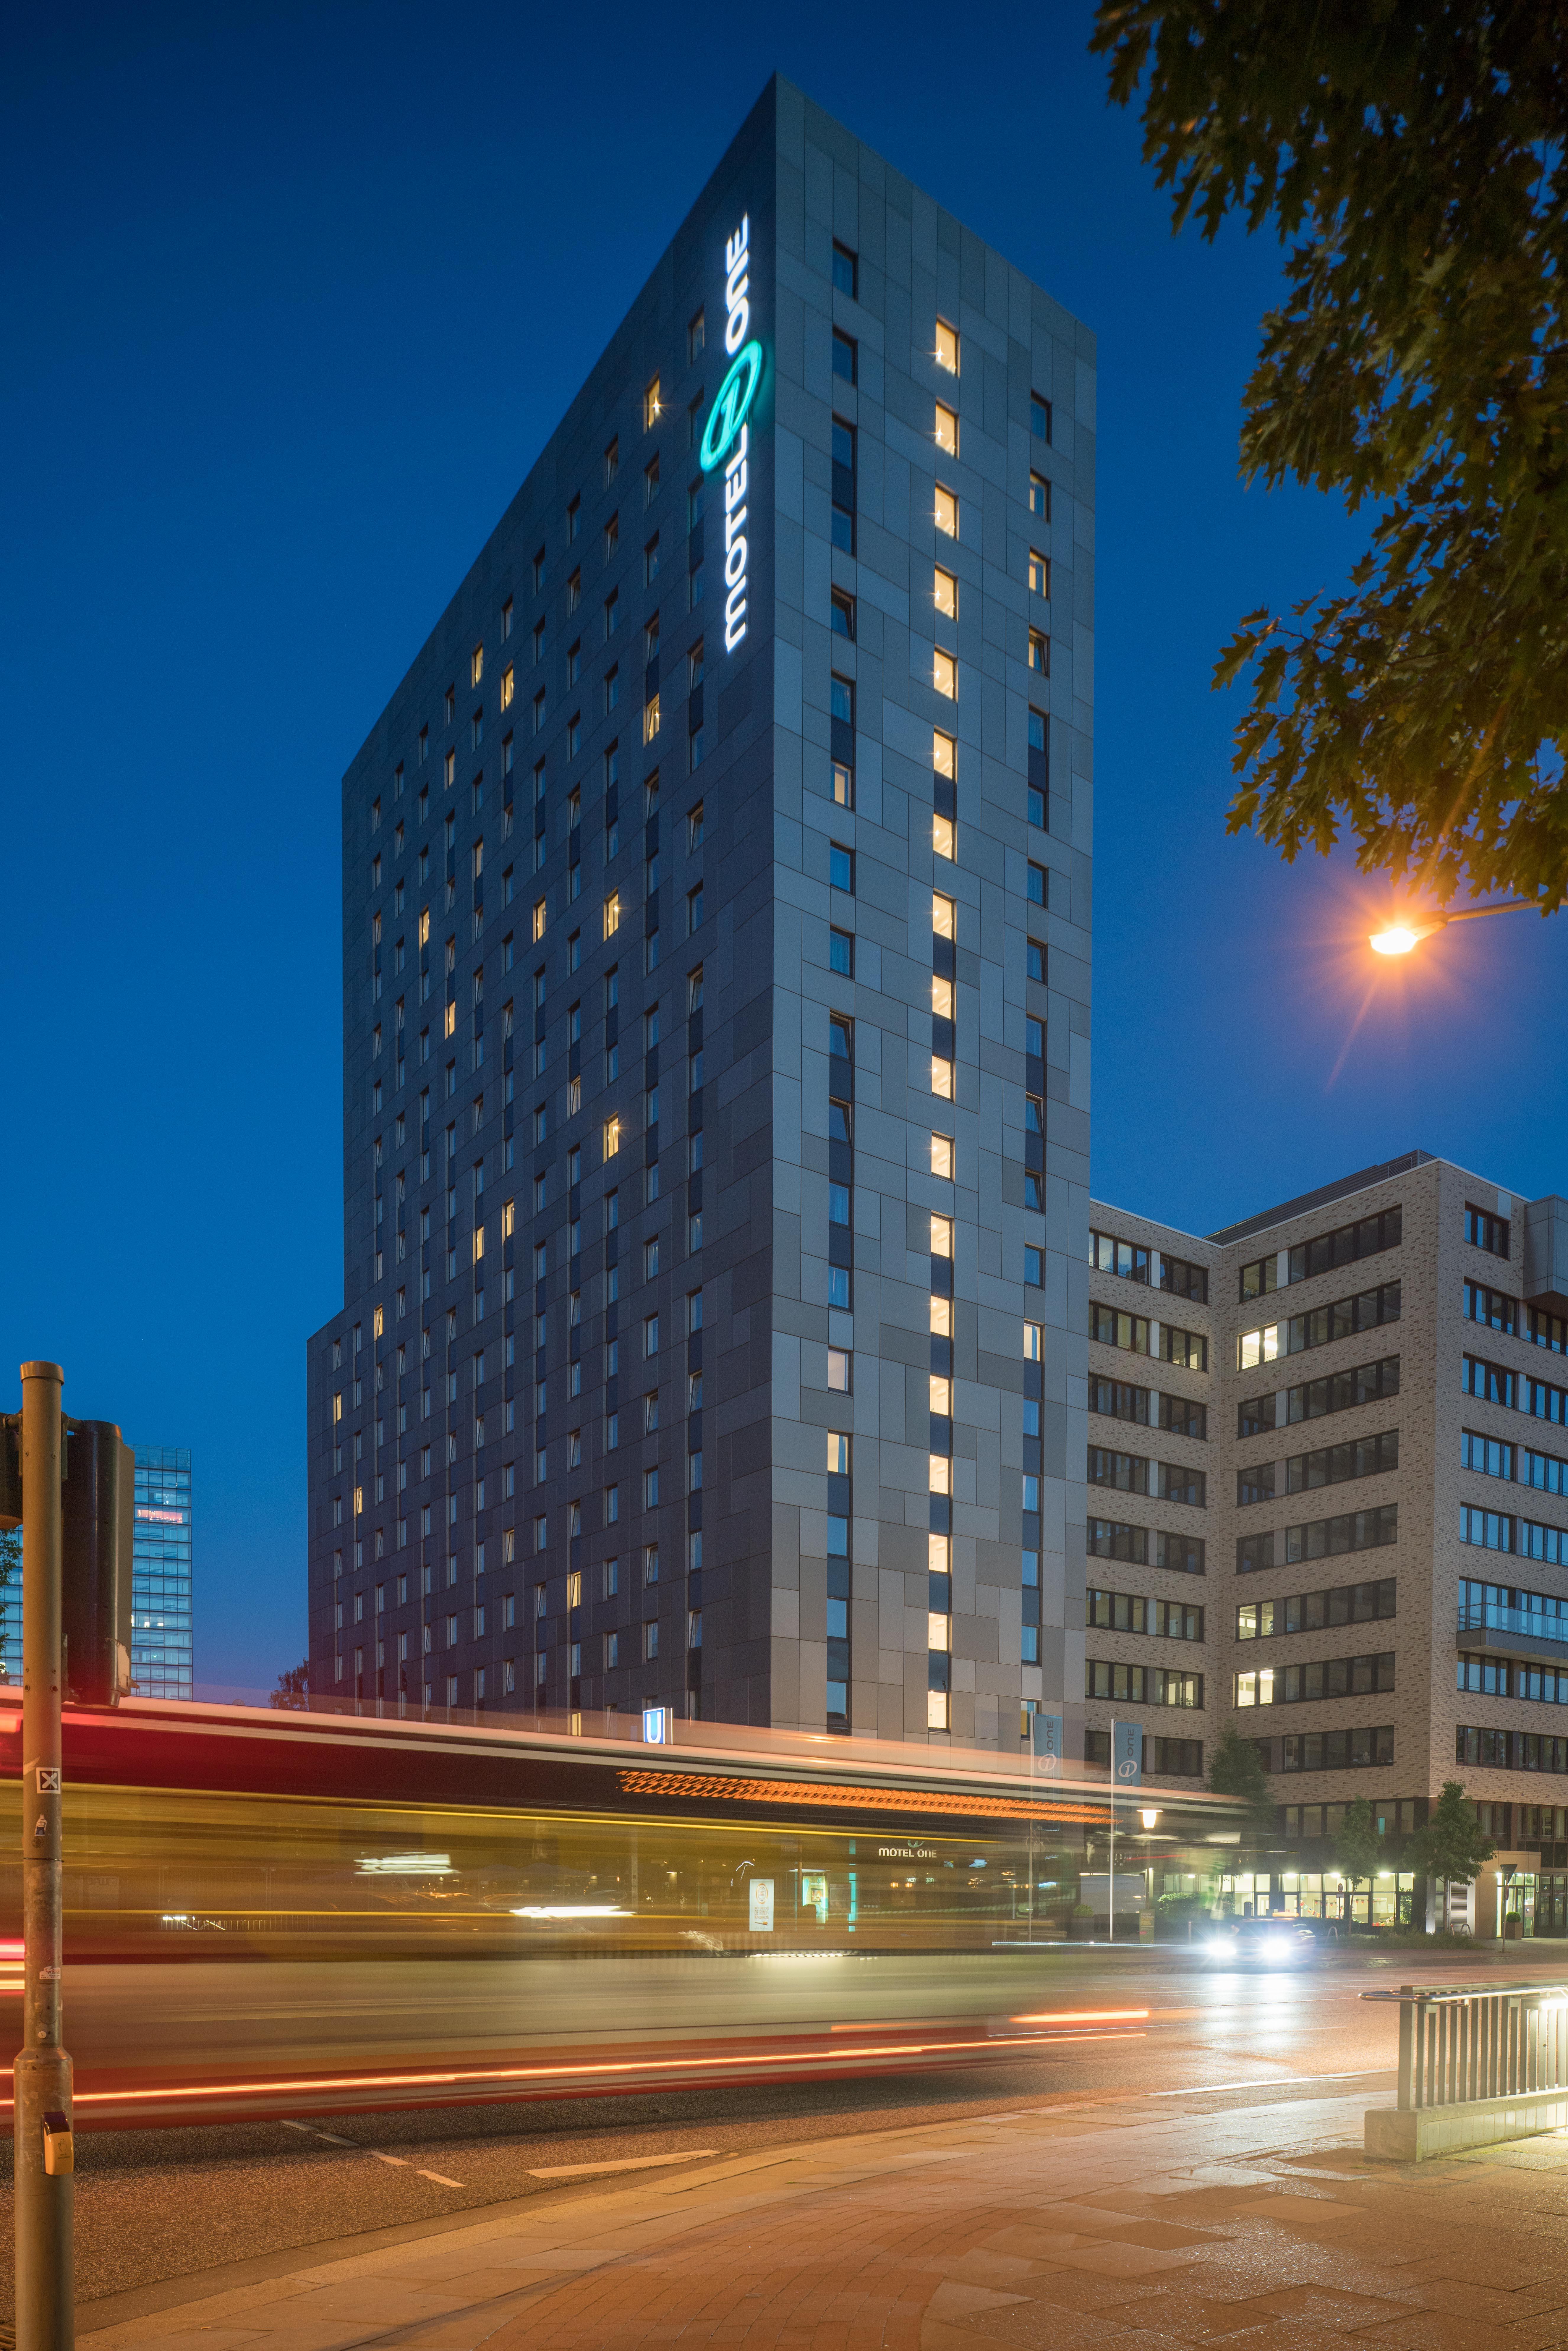 Permalink to Hotel Motel One Hamburg Alster Hamburg